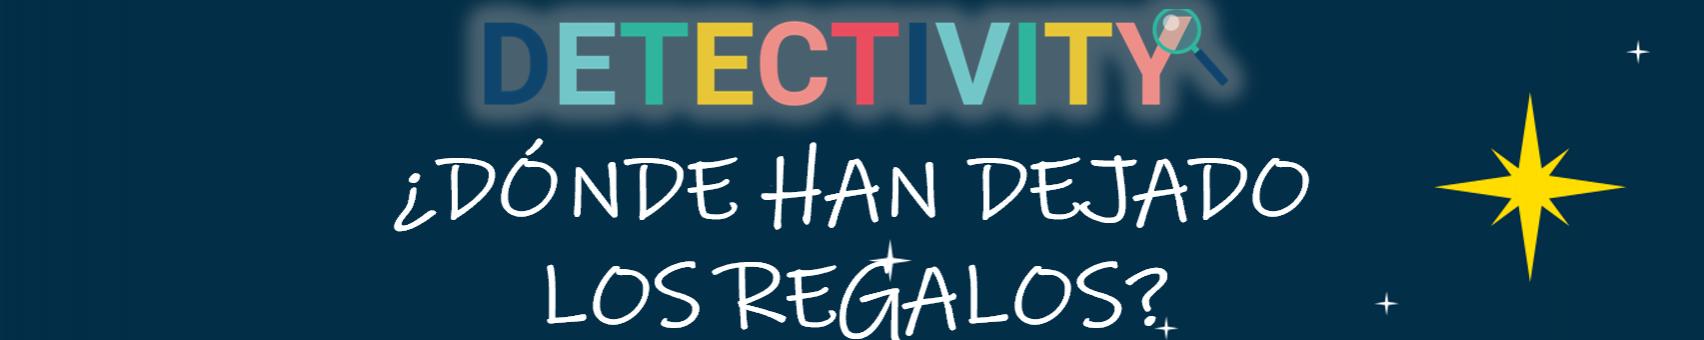 Detectivity Reyes 2021